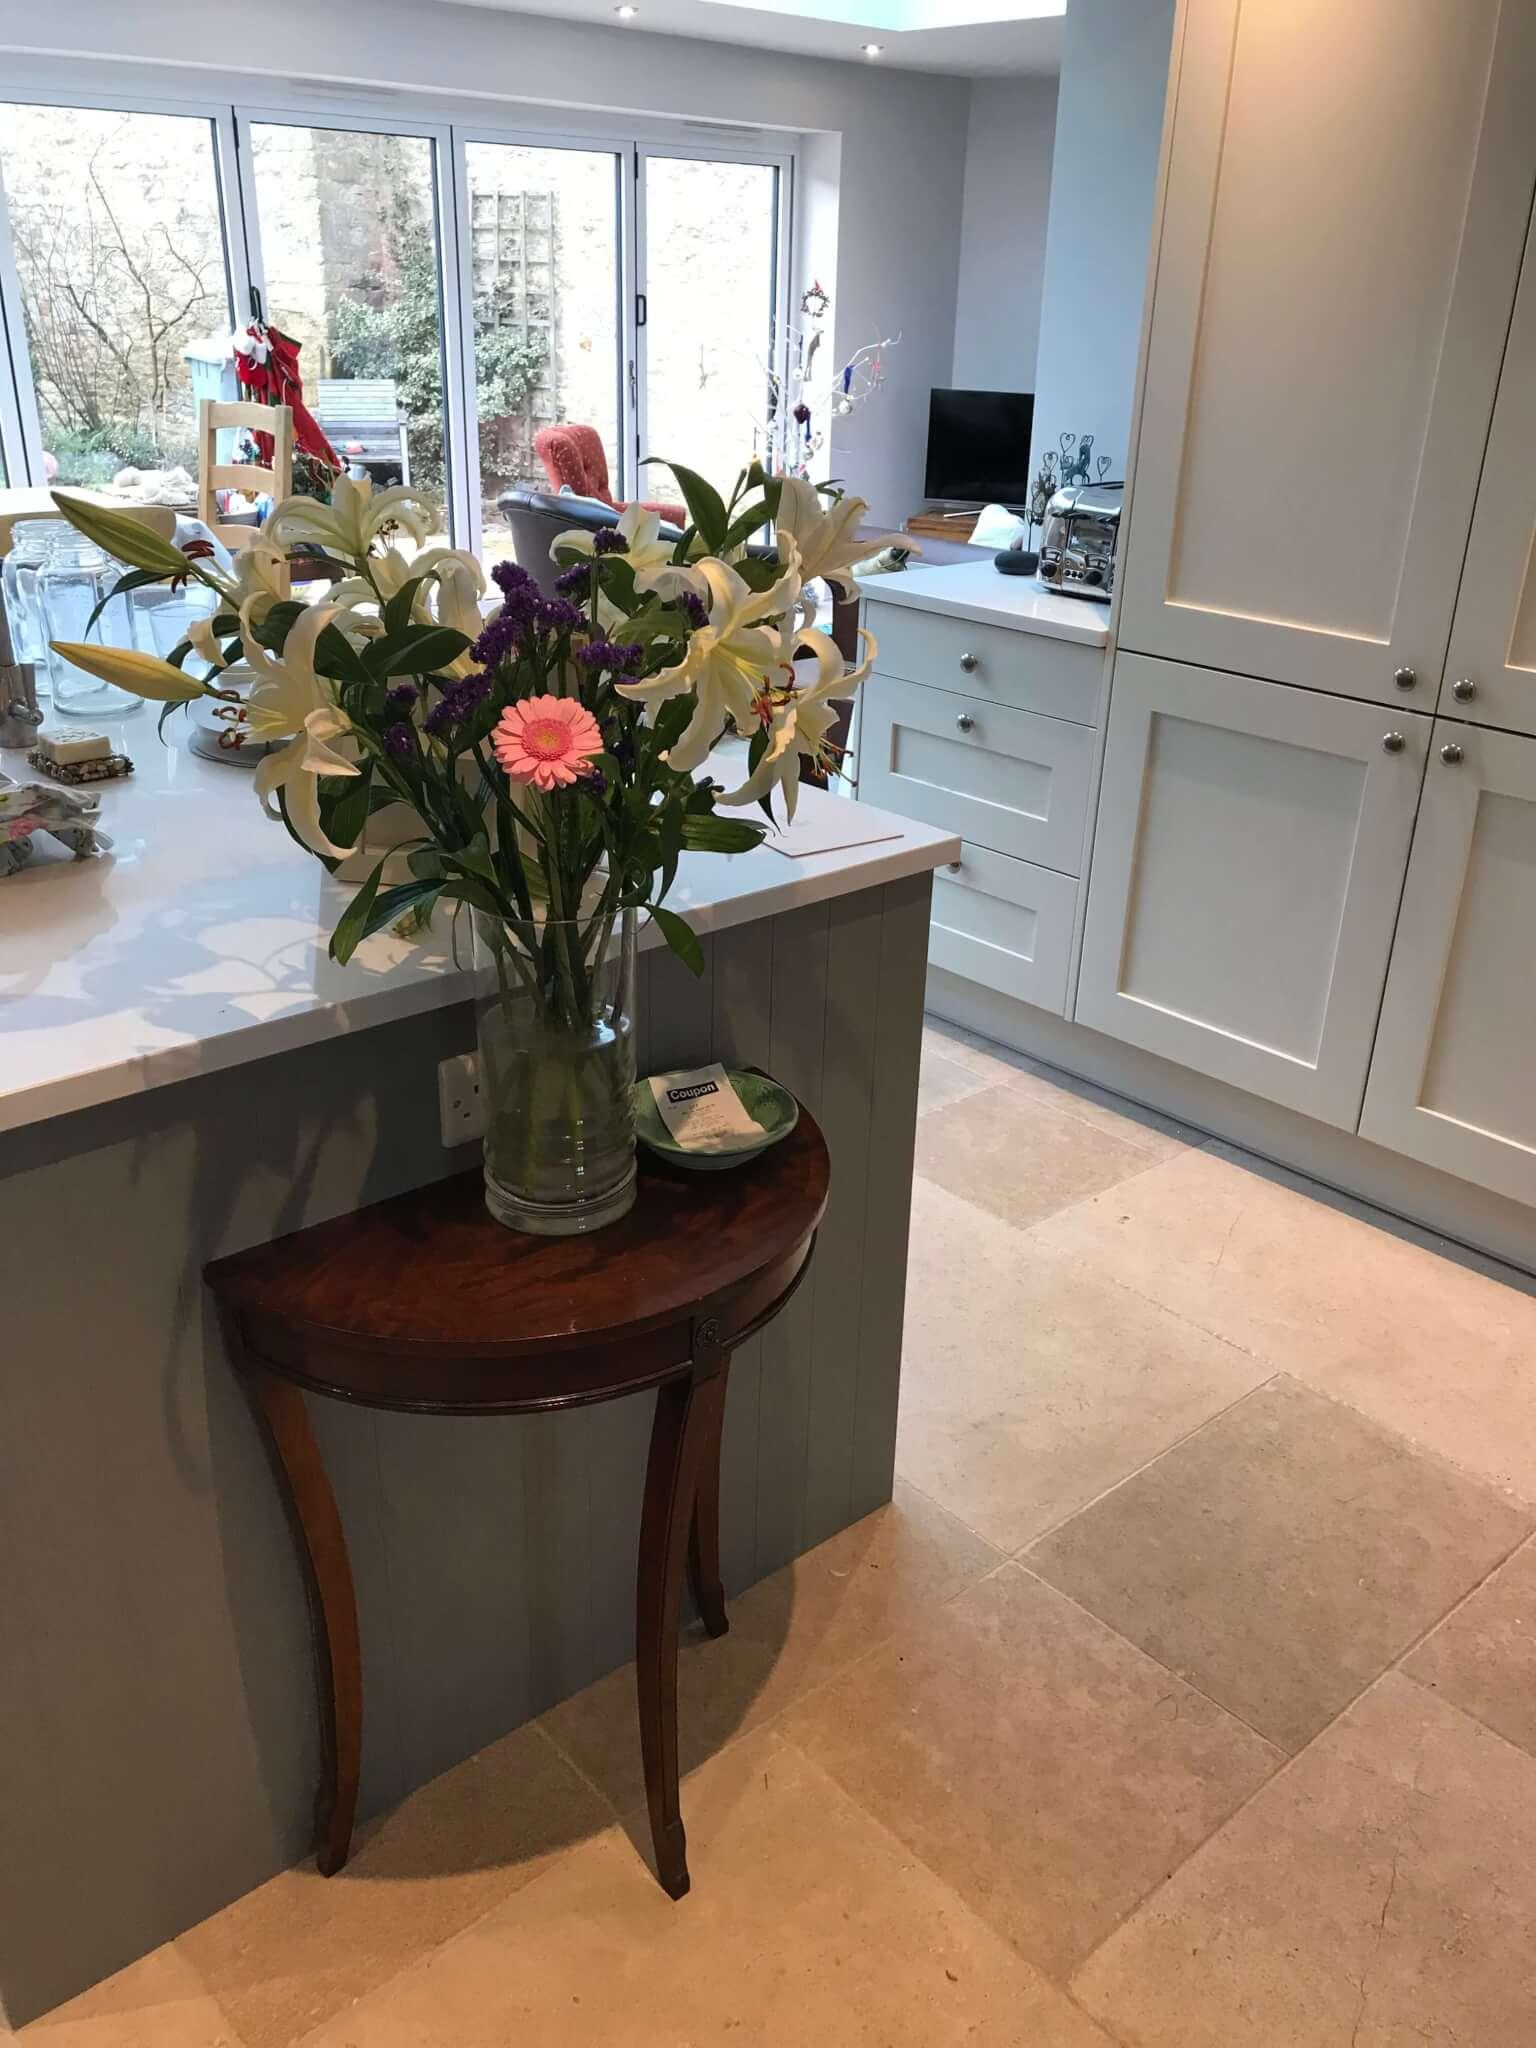 Bespoke kitchen and flooring